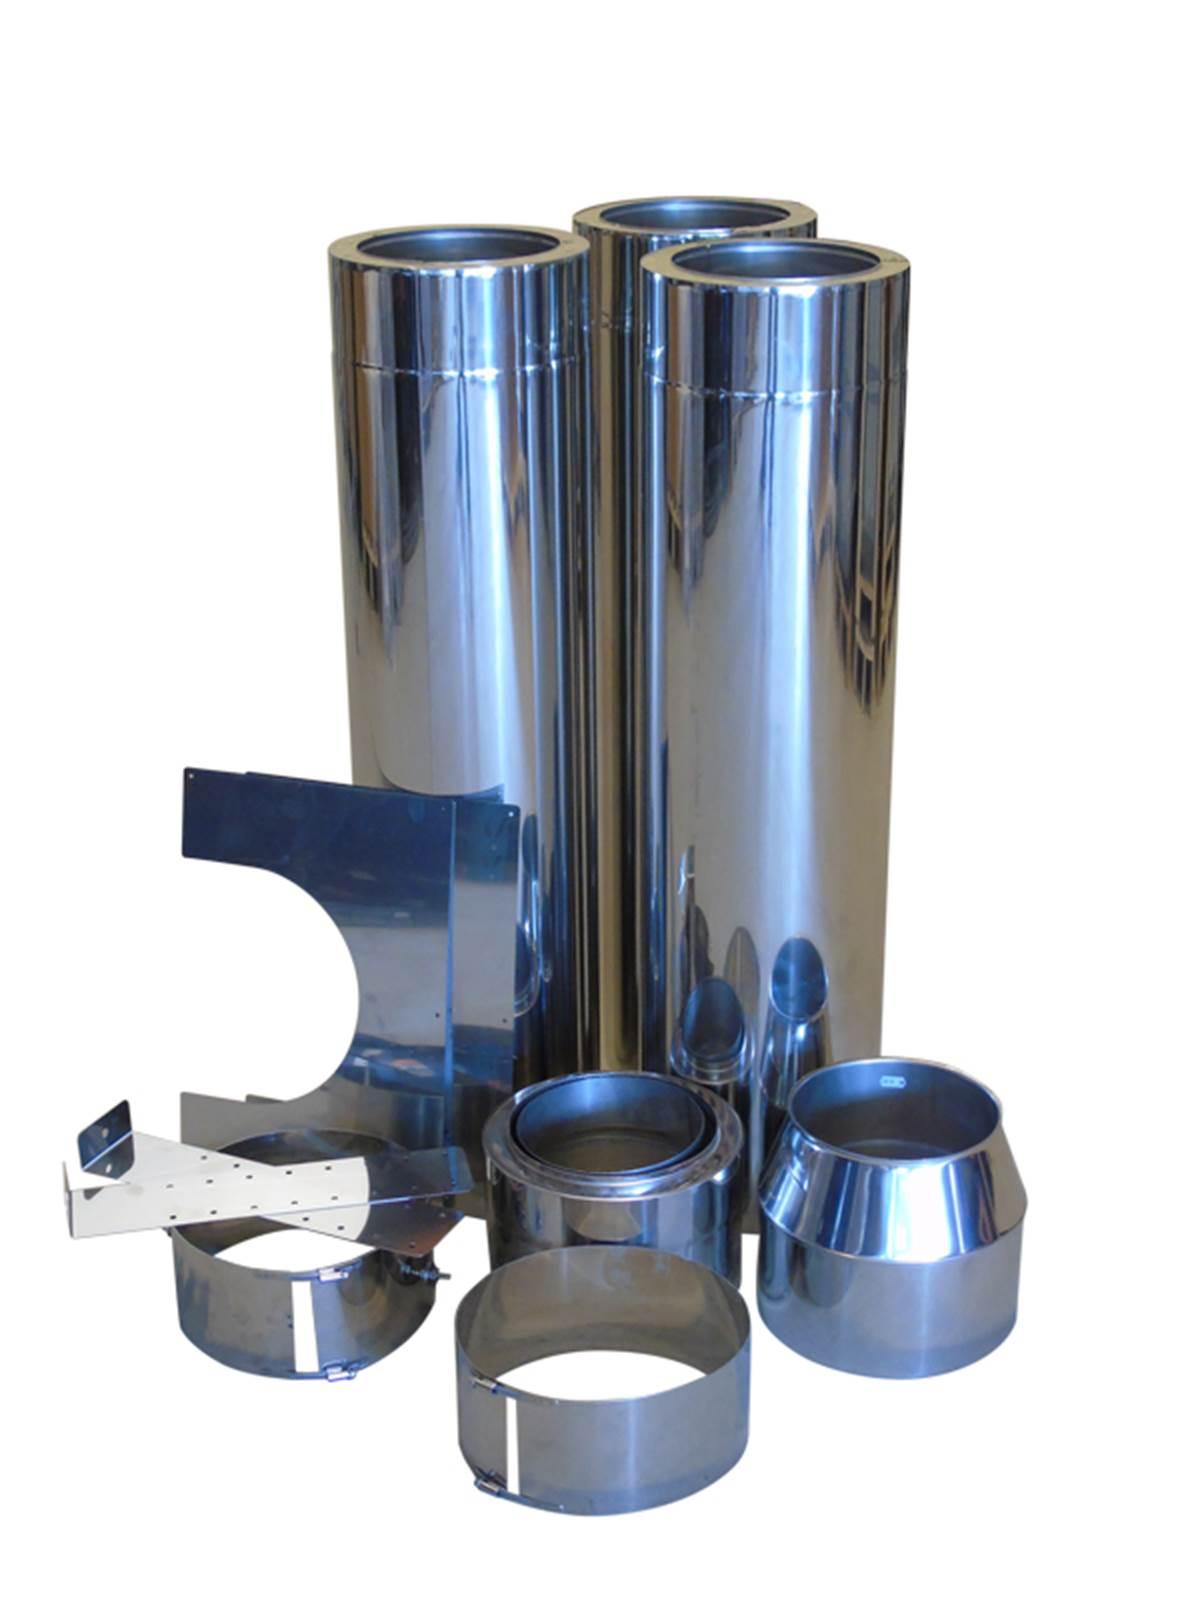 Stålpipepakke L400 cm (400/400) Ø 20 cm